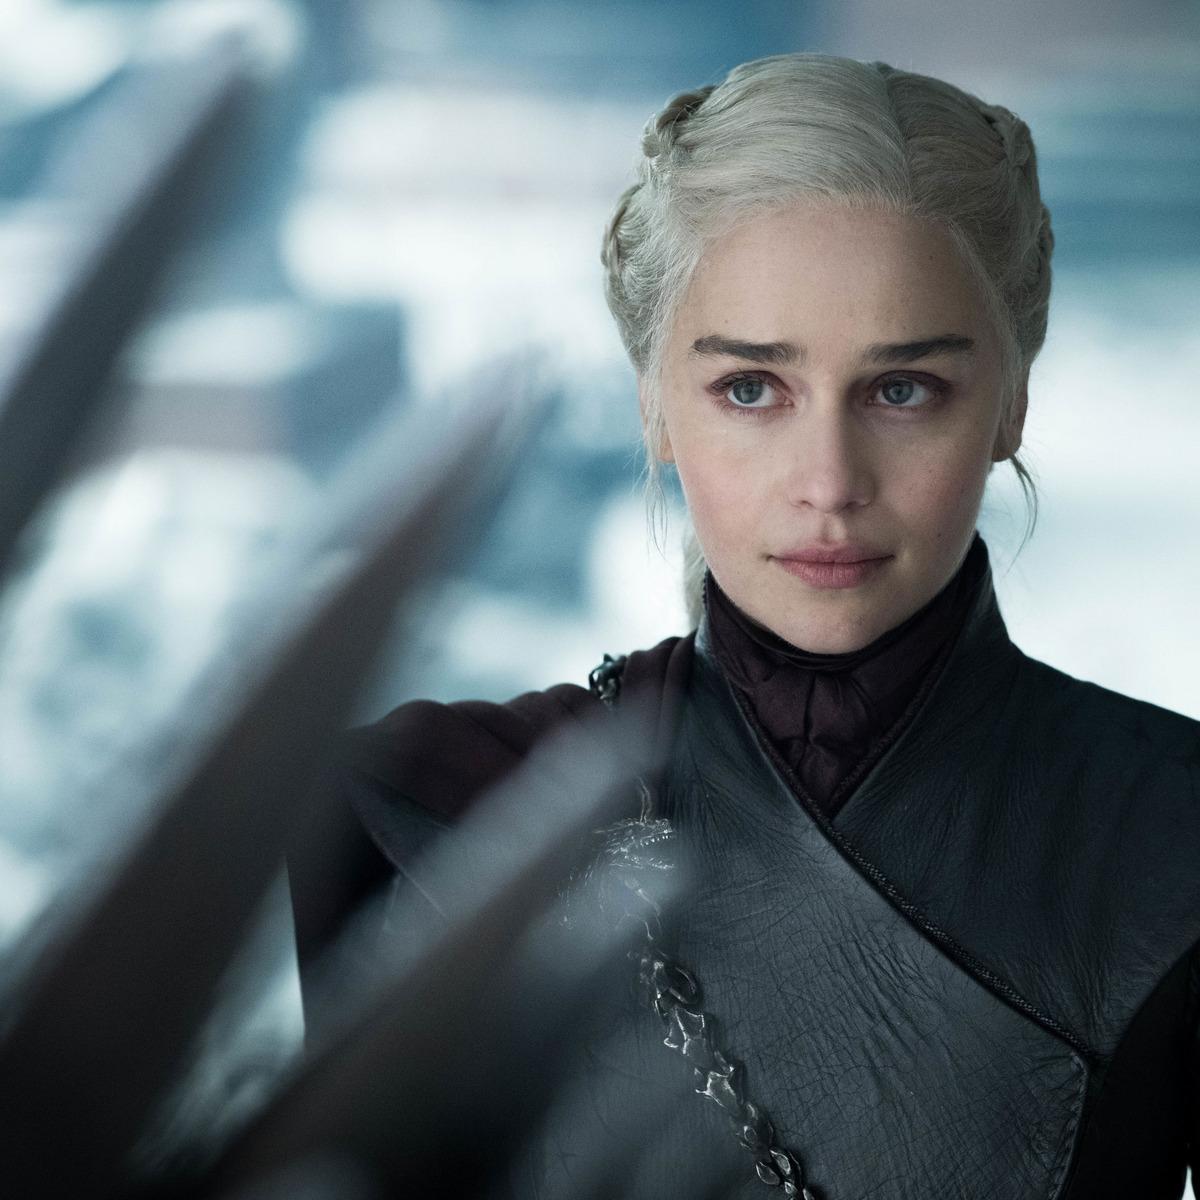 Game of Thrones' Finale Season 8 Episode 6 Memes